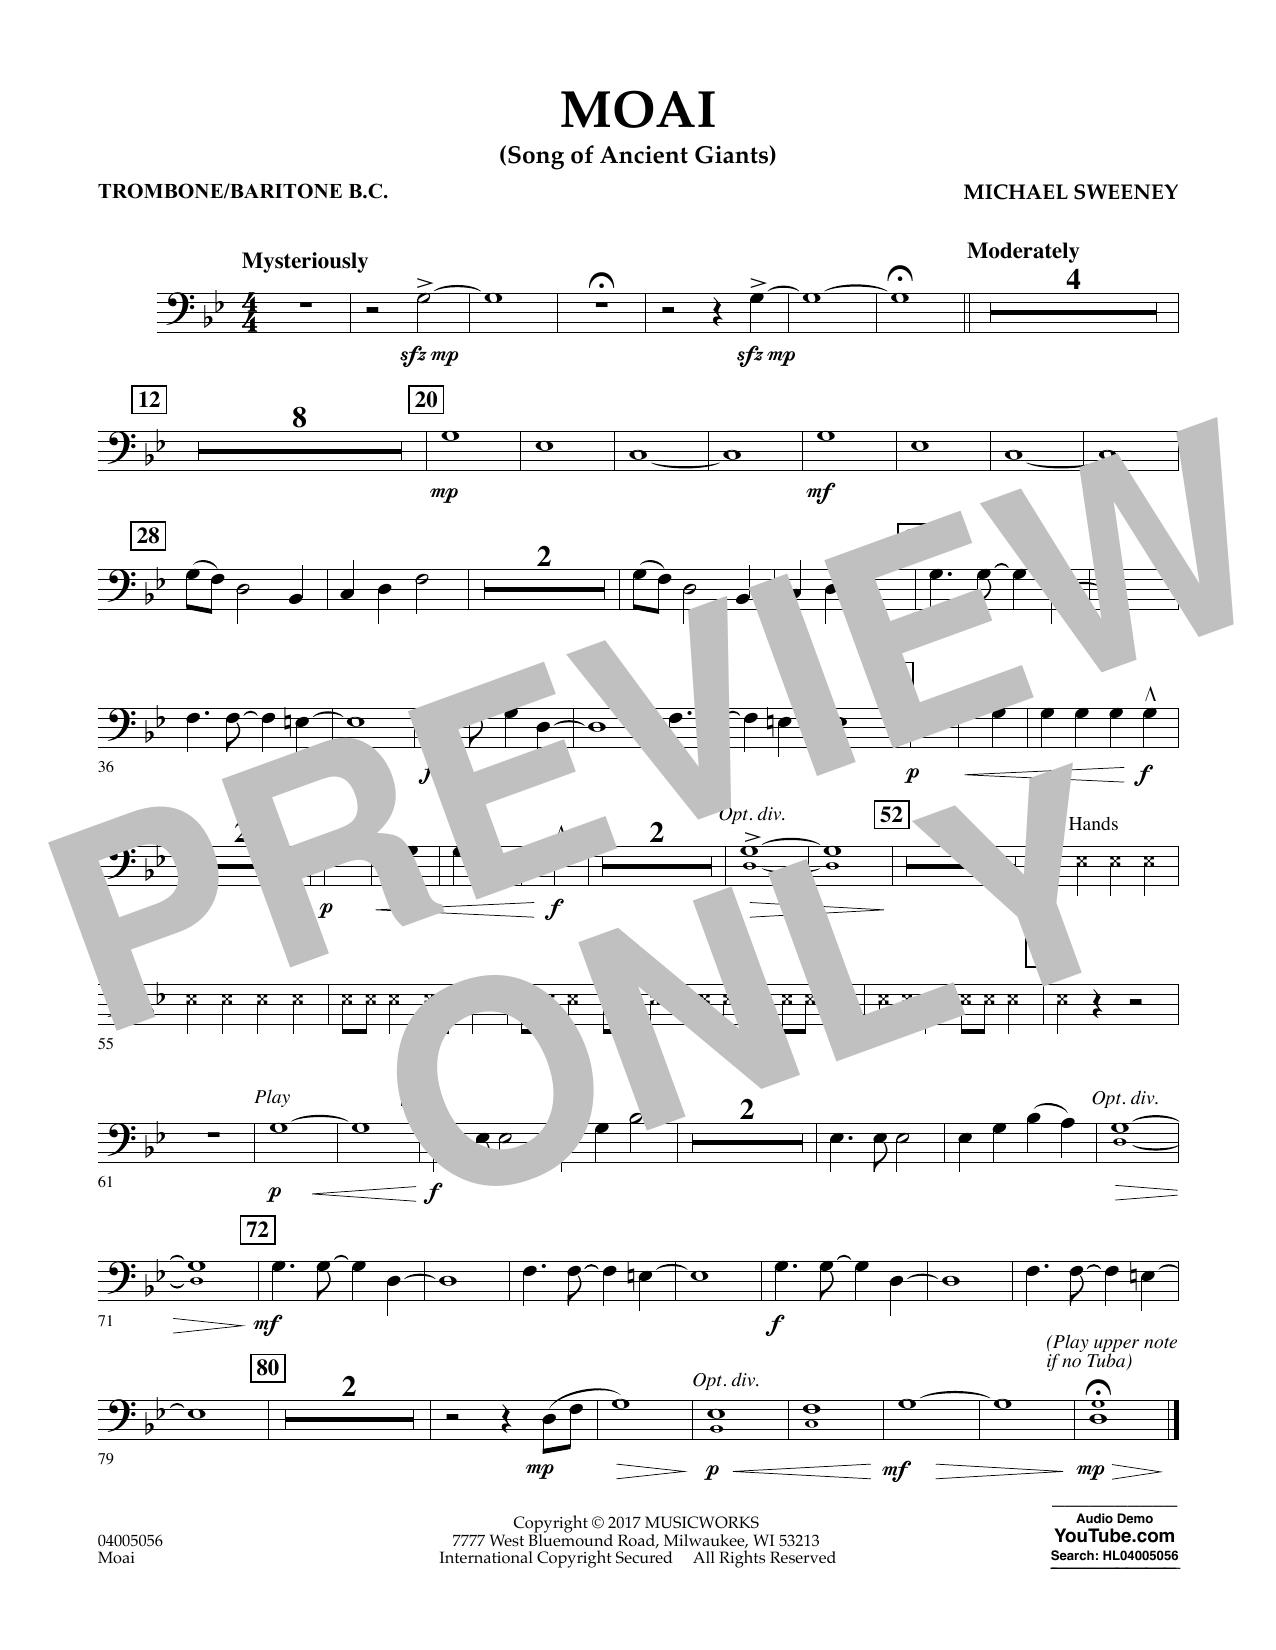 Moai (Songs of Ancient Giants) - Trombone/Baritone B.C. Sheet Music